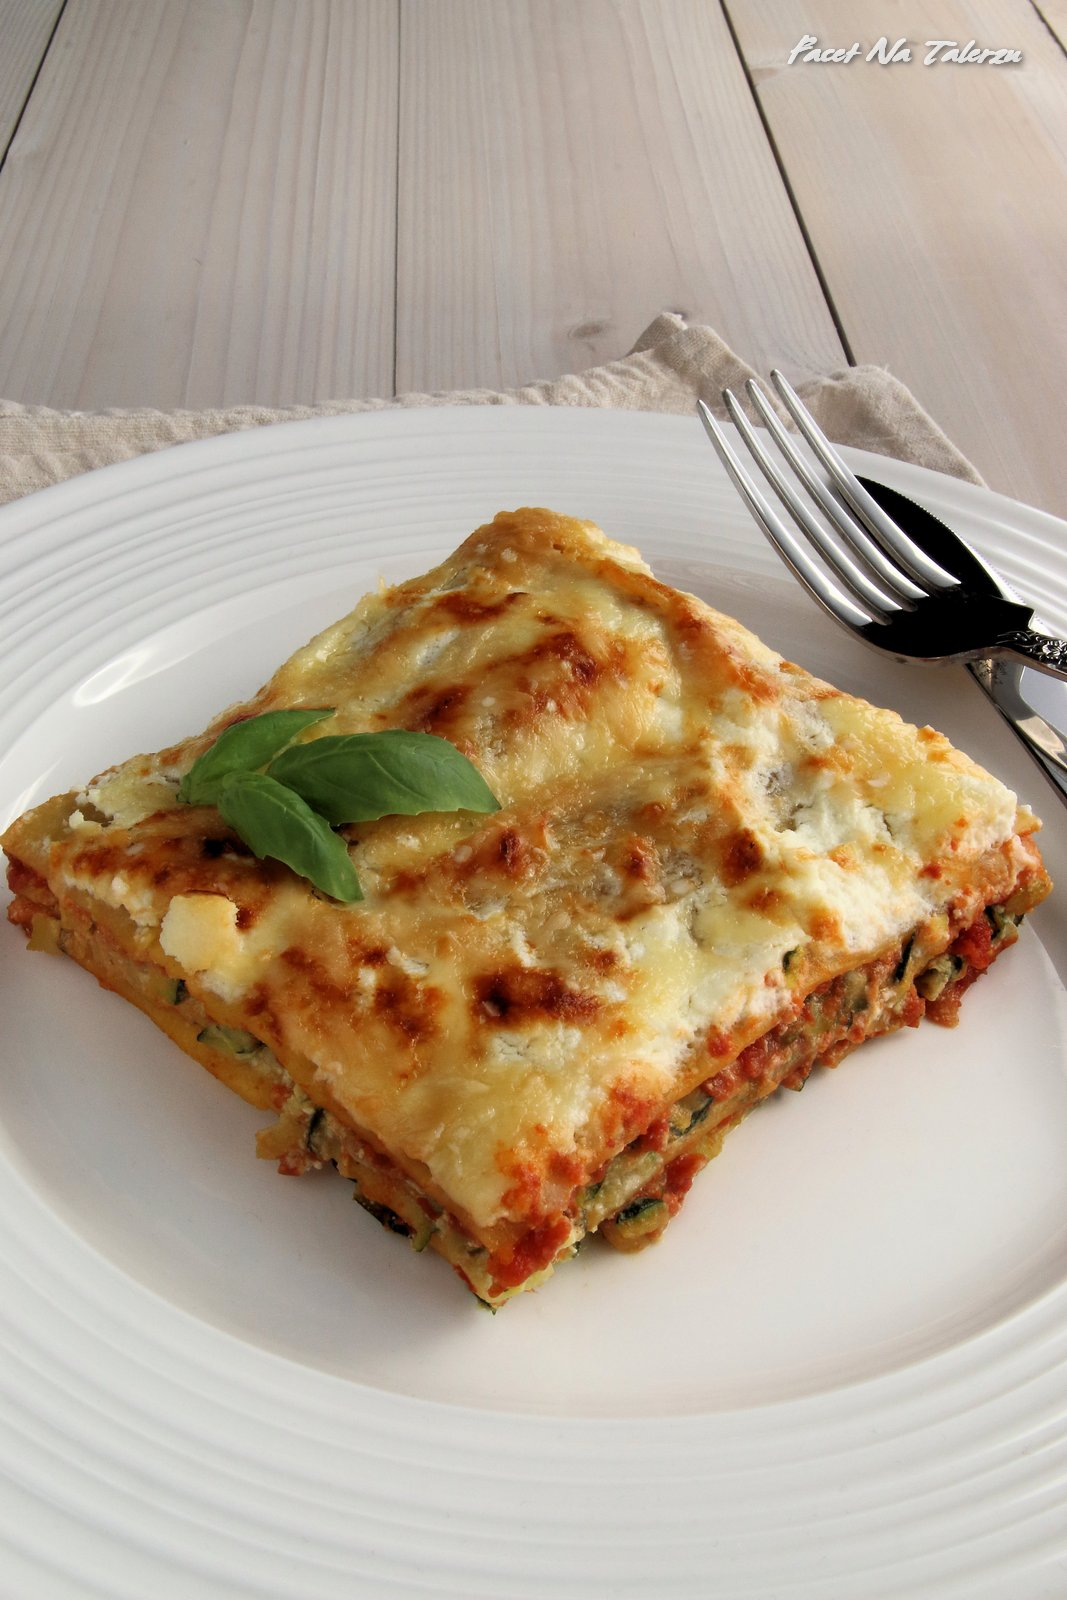 Lasagne Z Cukinia I Serem Ricotta Facet Na Talerzu